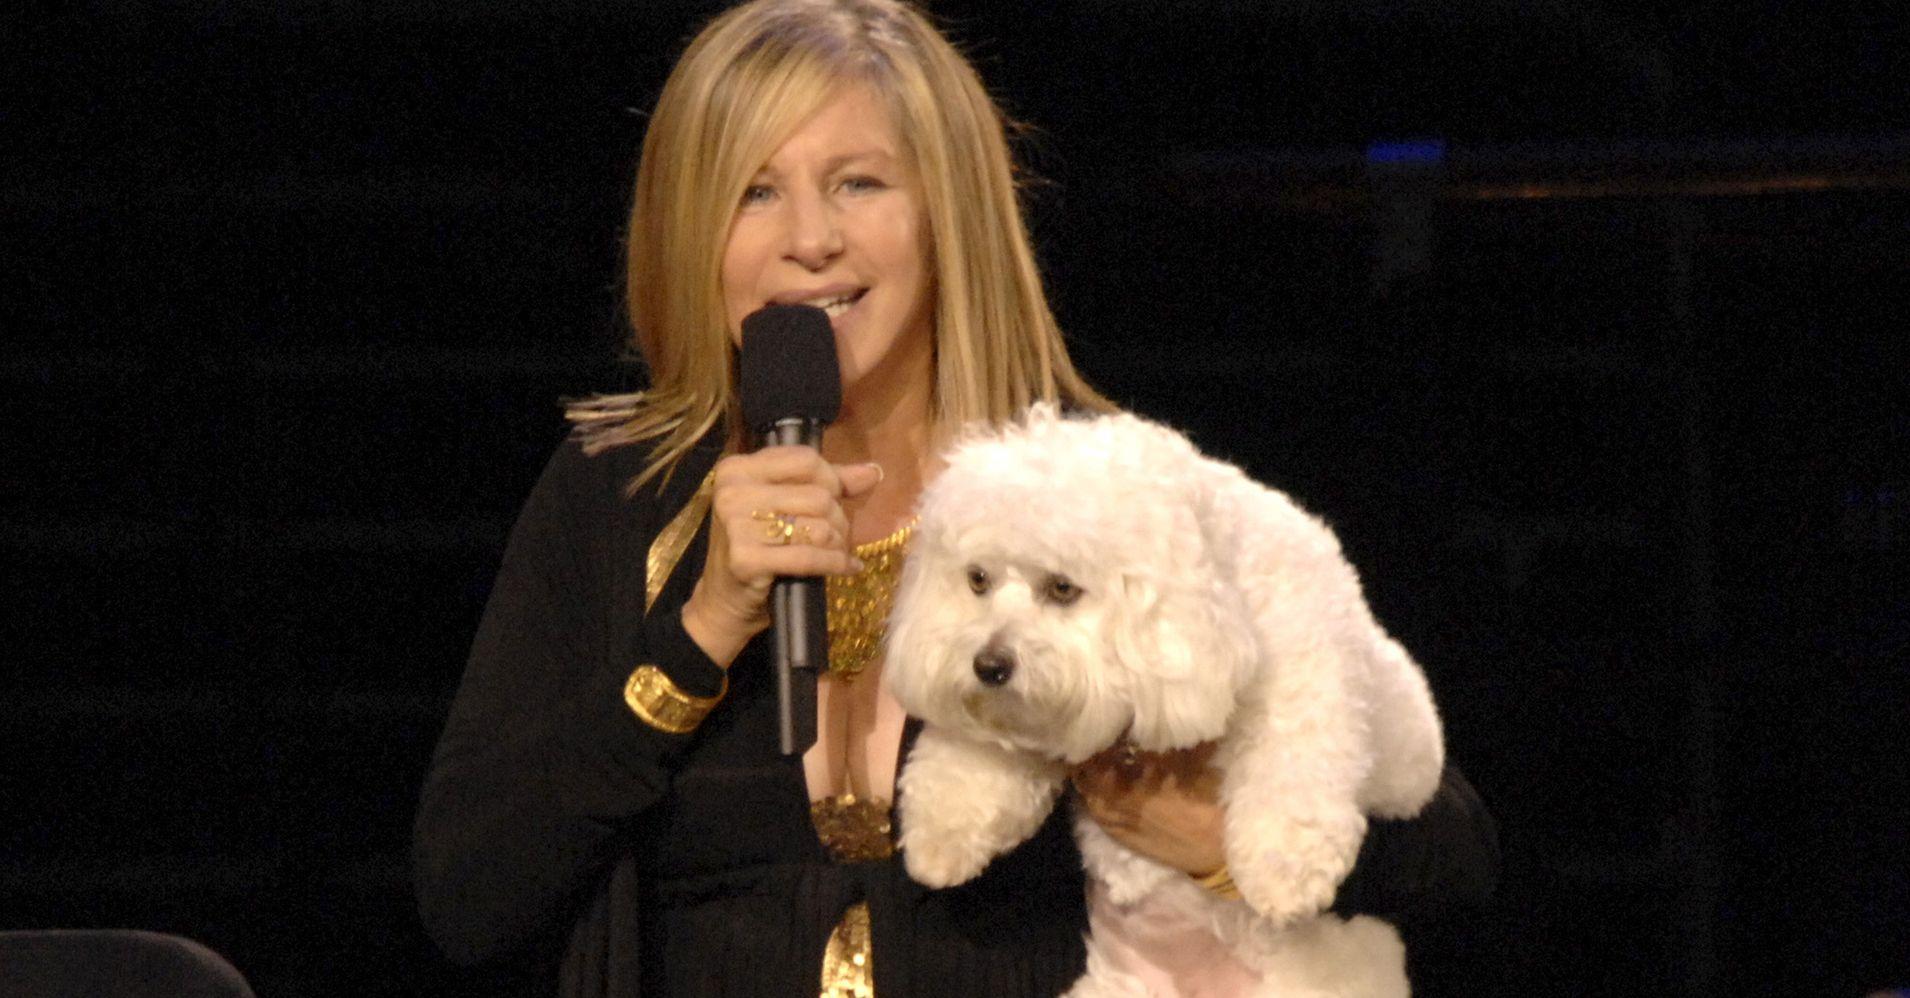 Barbra Streisand Had Her Dog, Samantha, Cloned Twice